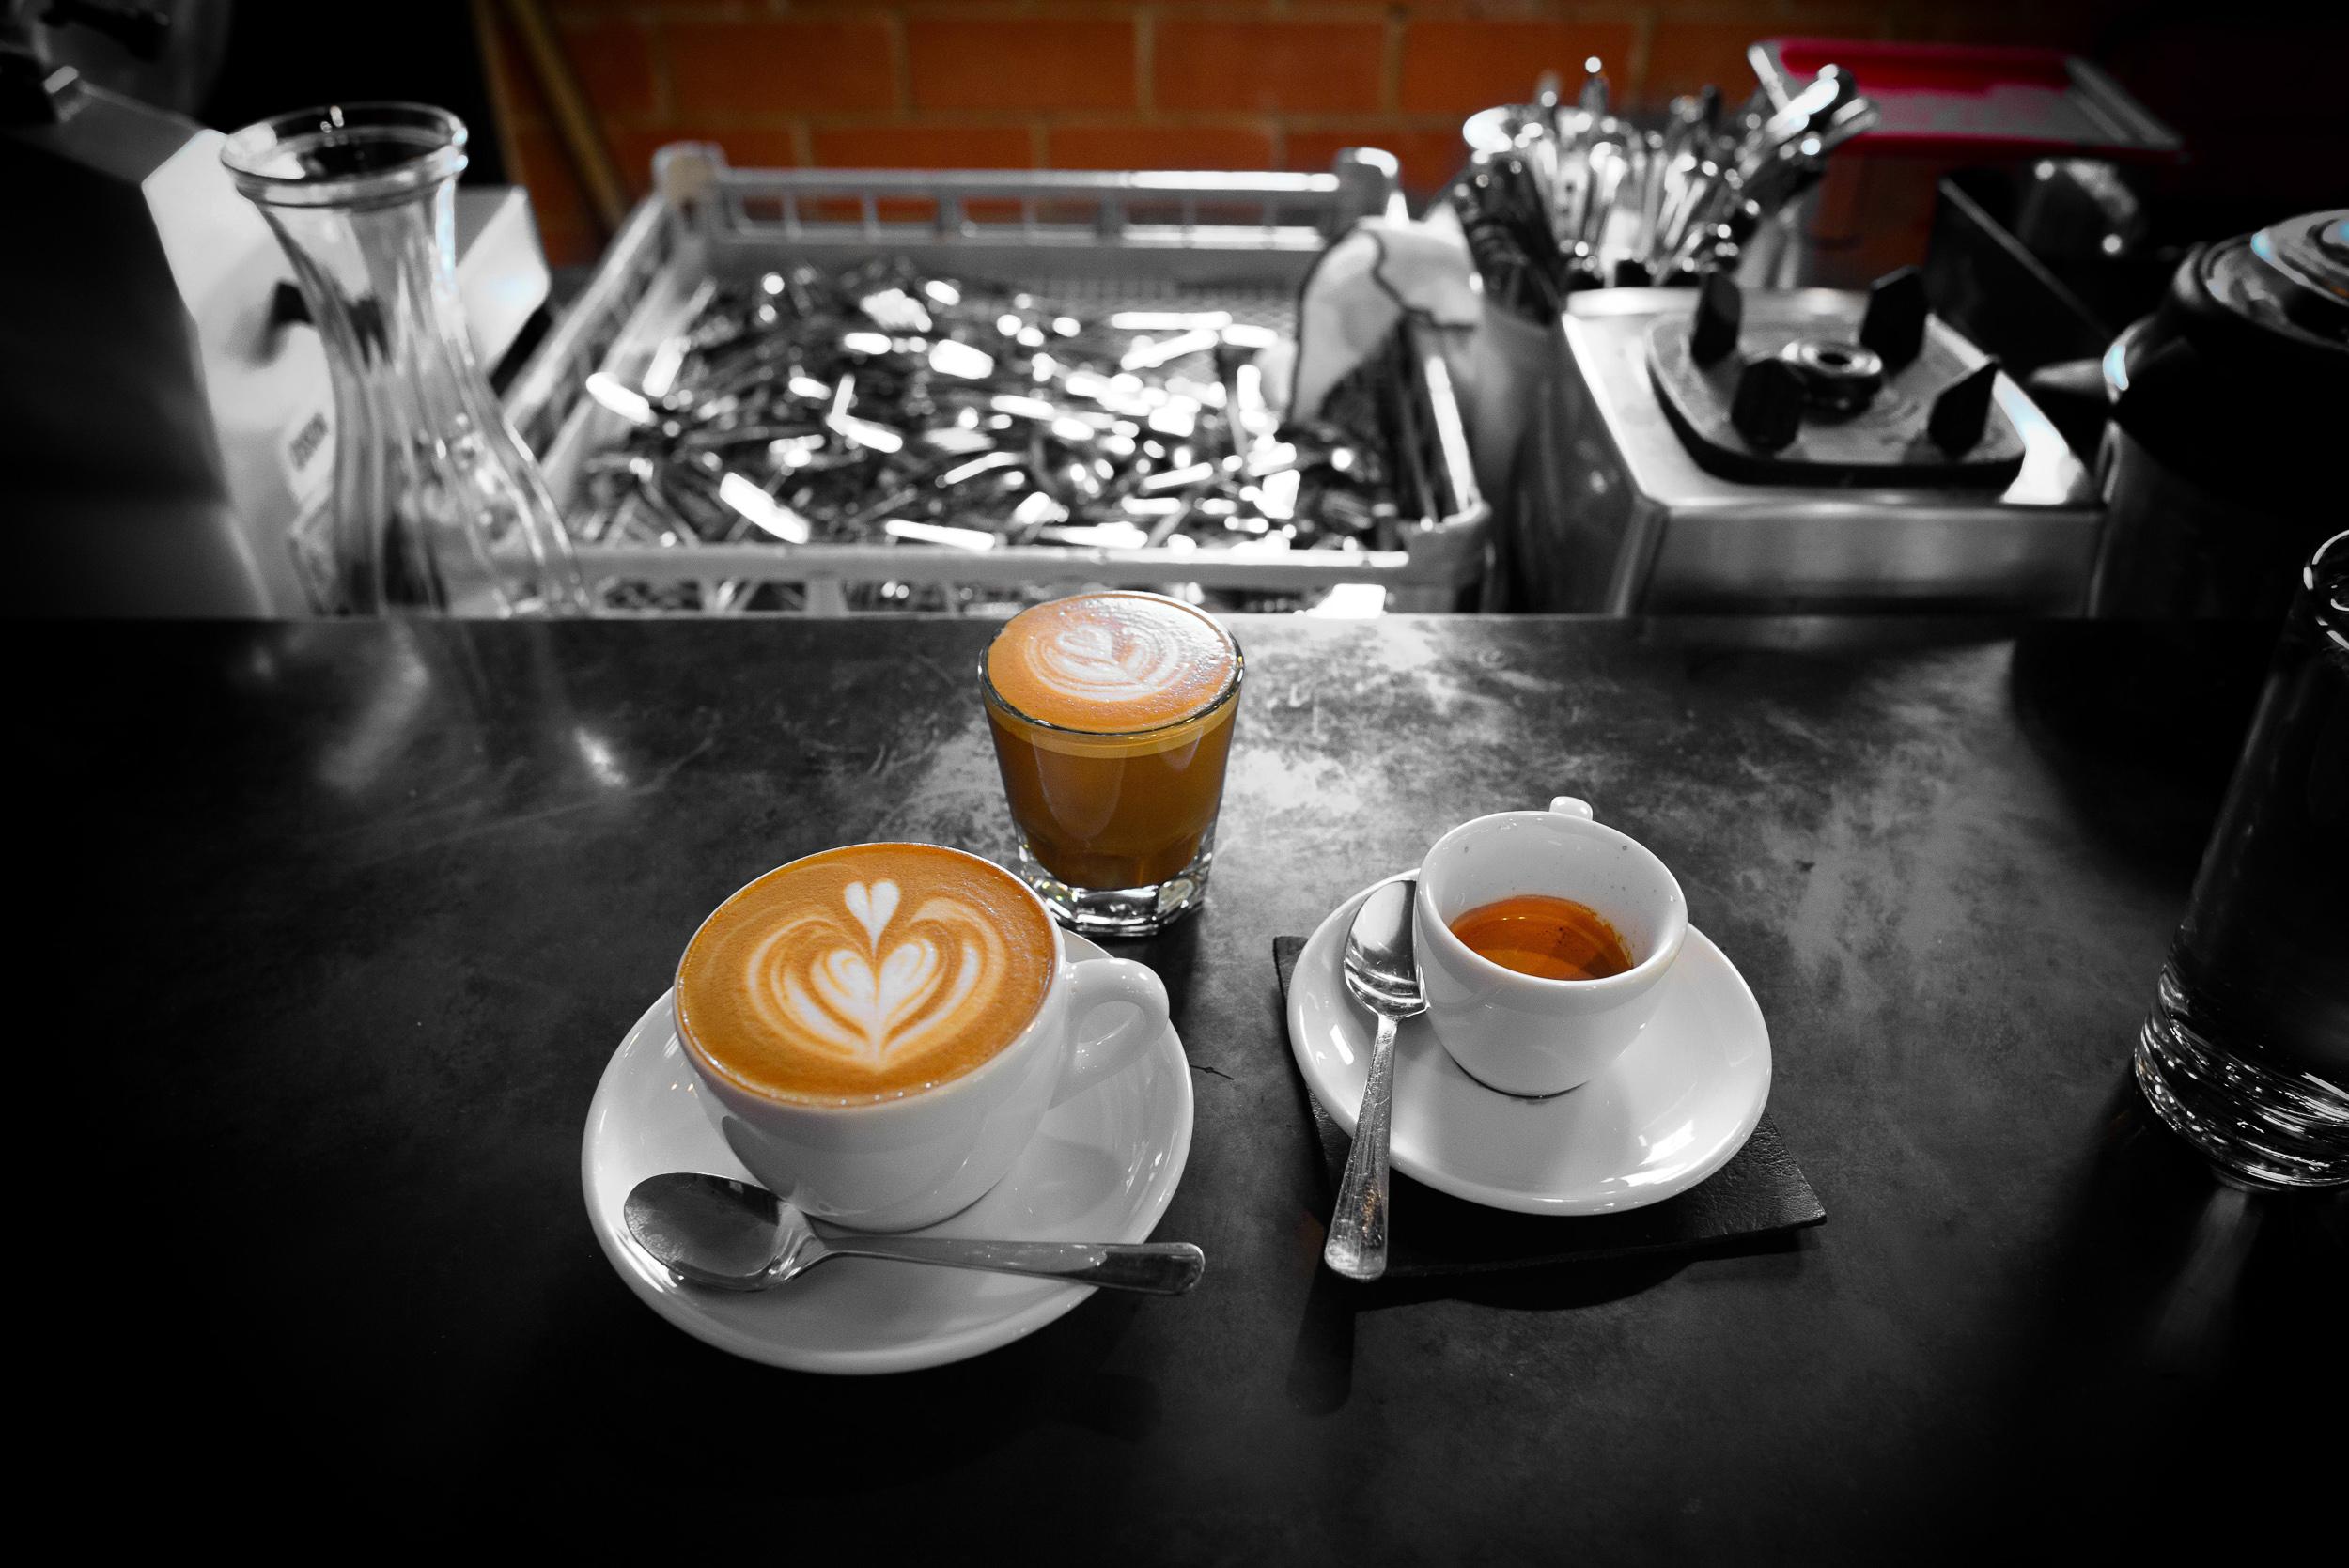 Cappuccino and macchiato with Greenway's Papua New Guinea blend;